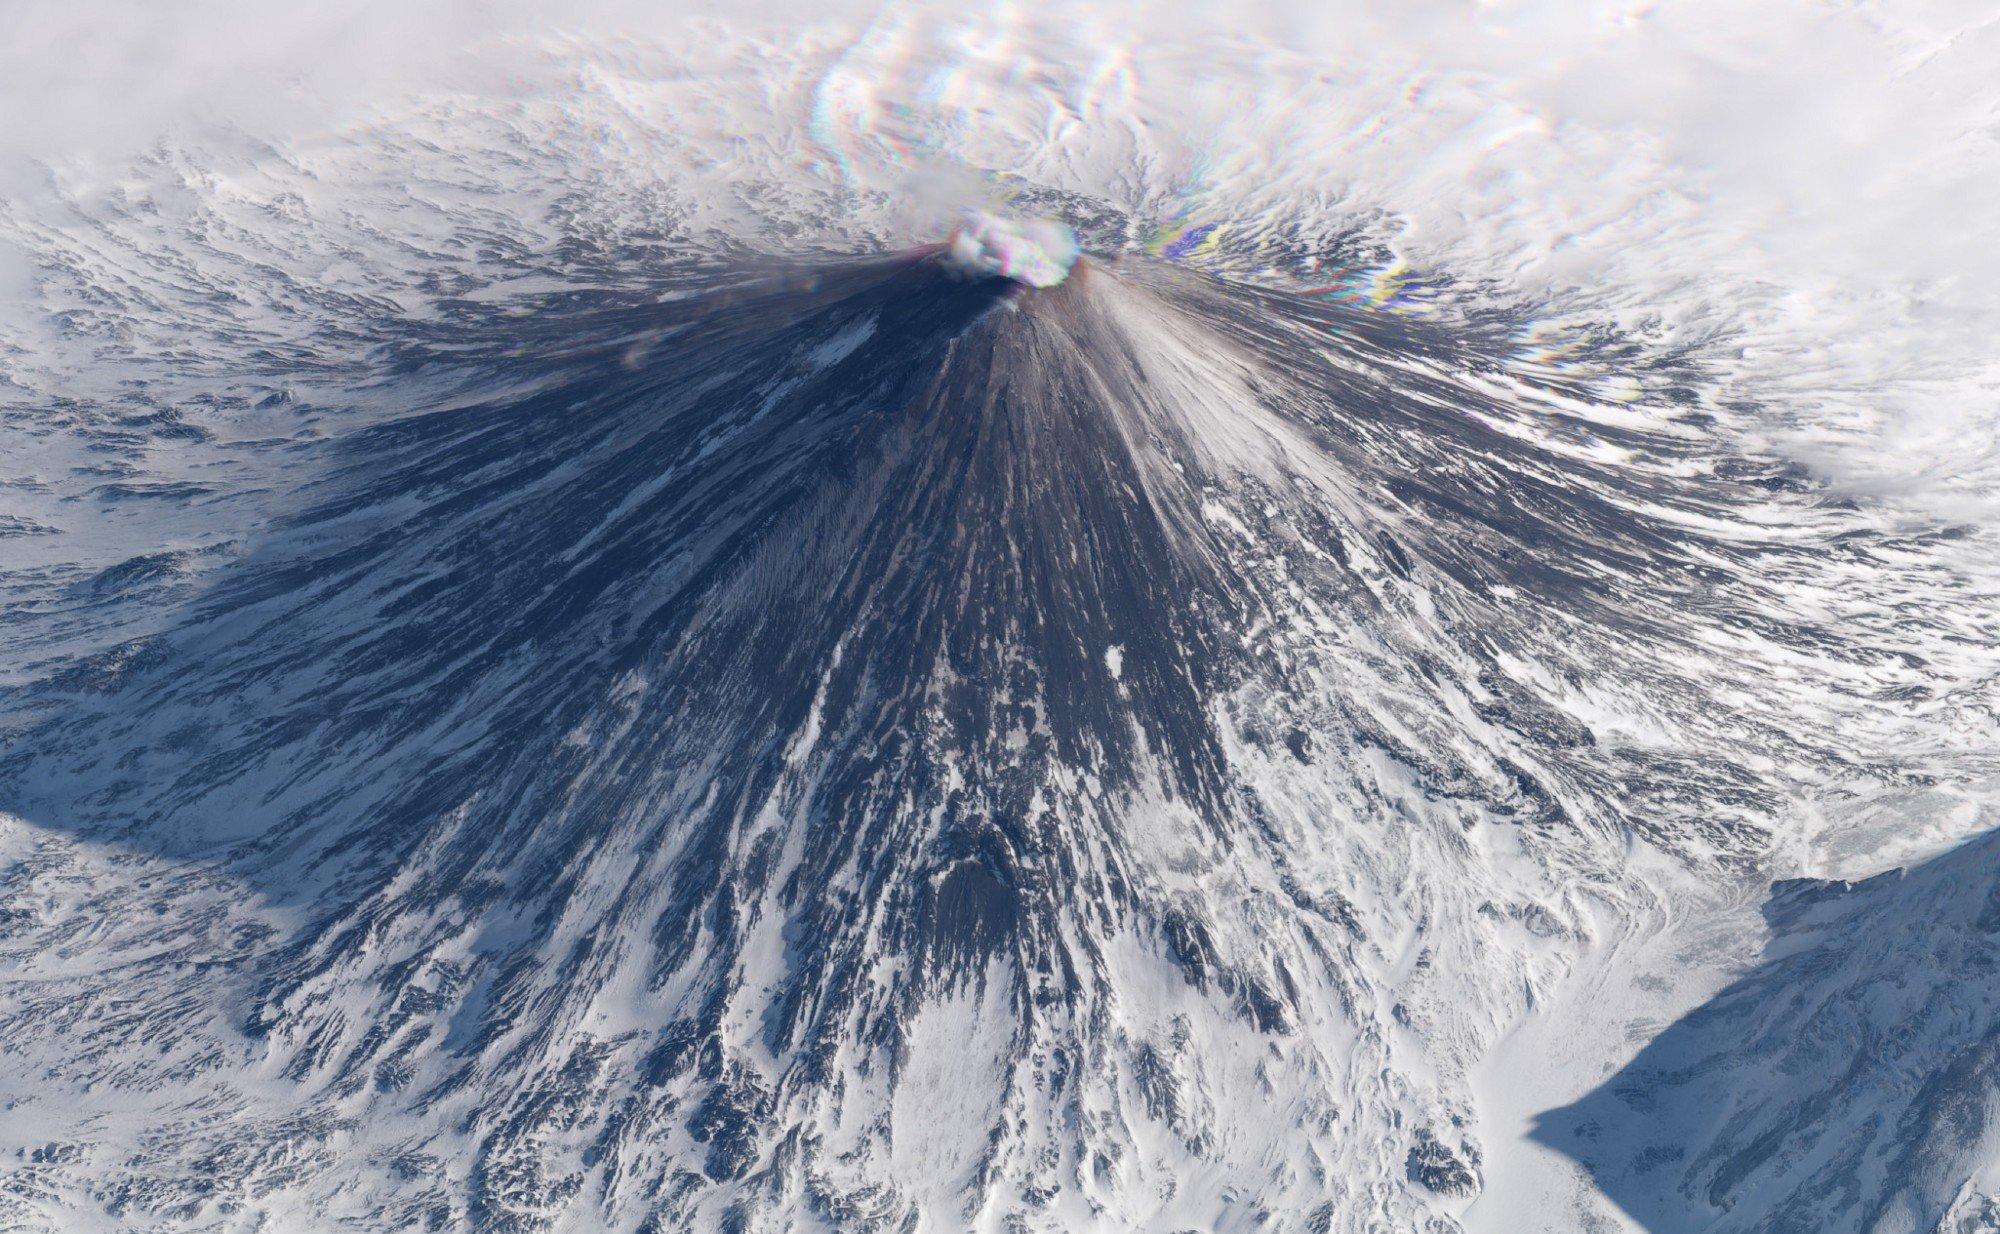 Klyuchevskaya Volcano, Russia. March 11, 2018. Image ©2018 Planet Labs, Inc. cc-by-sa4.0.